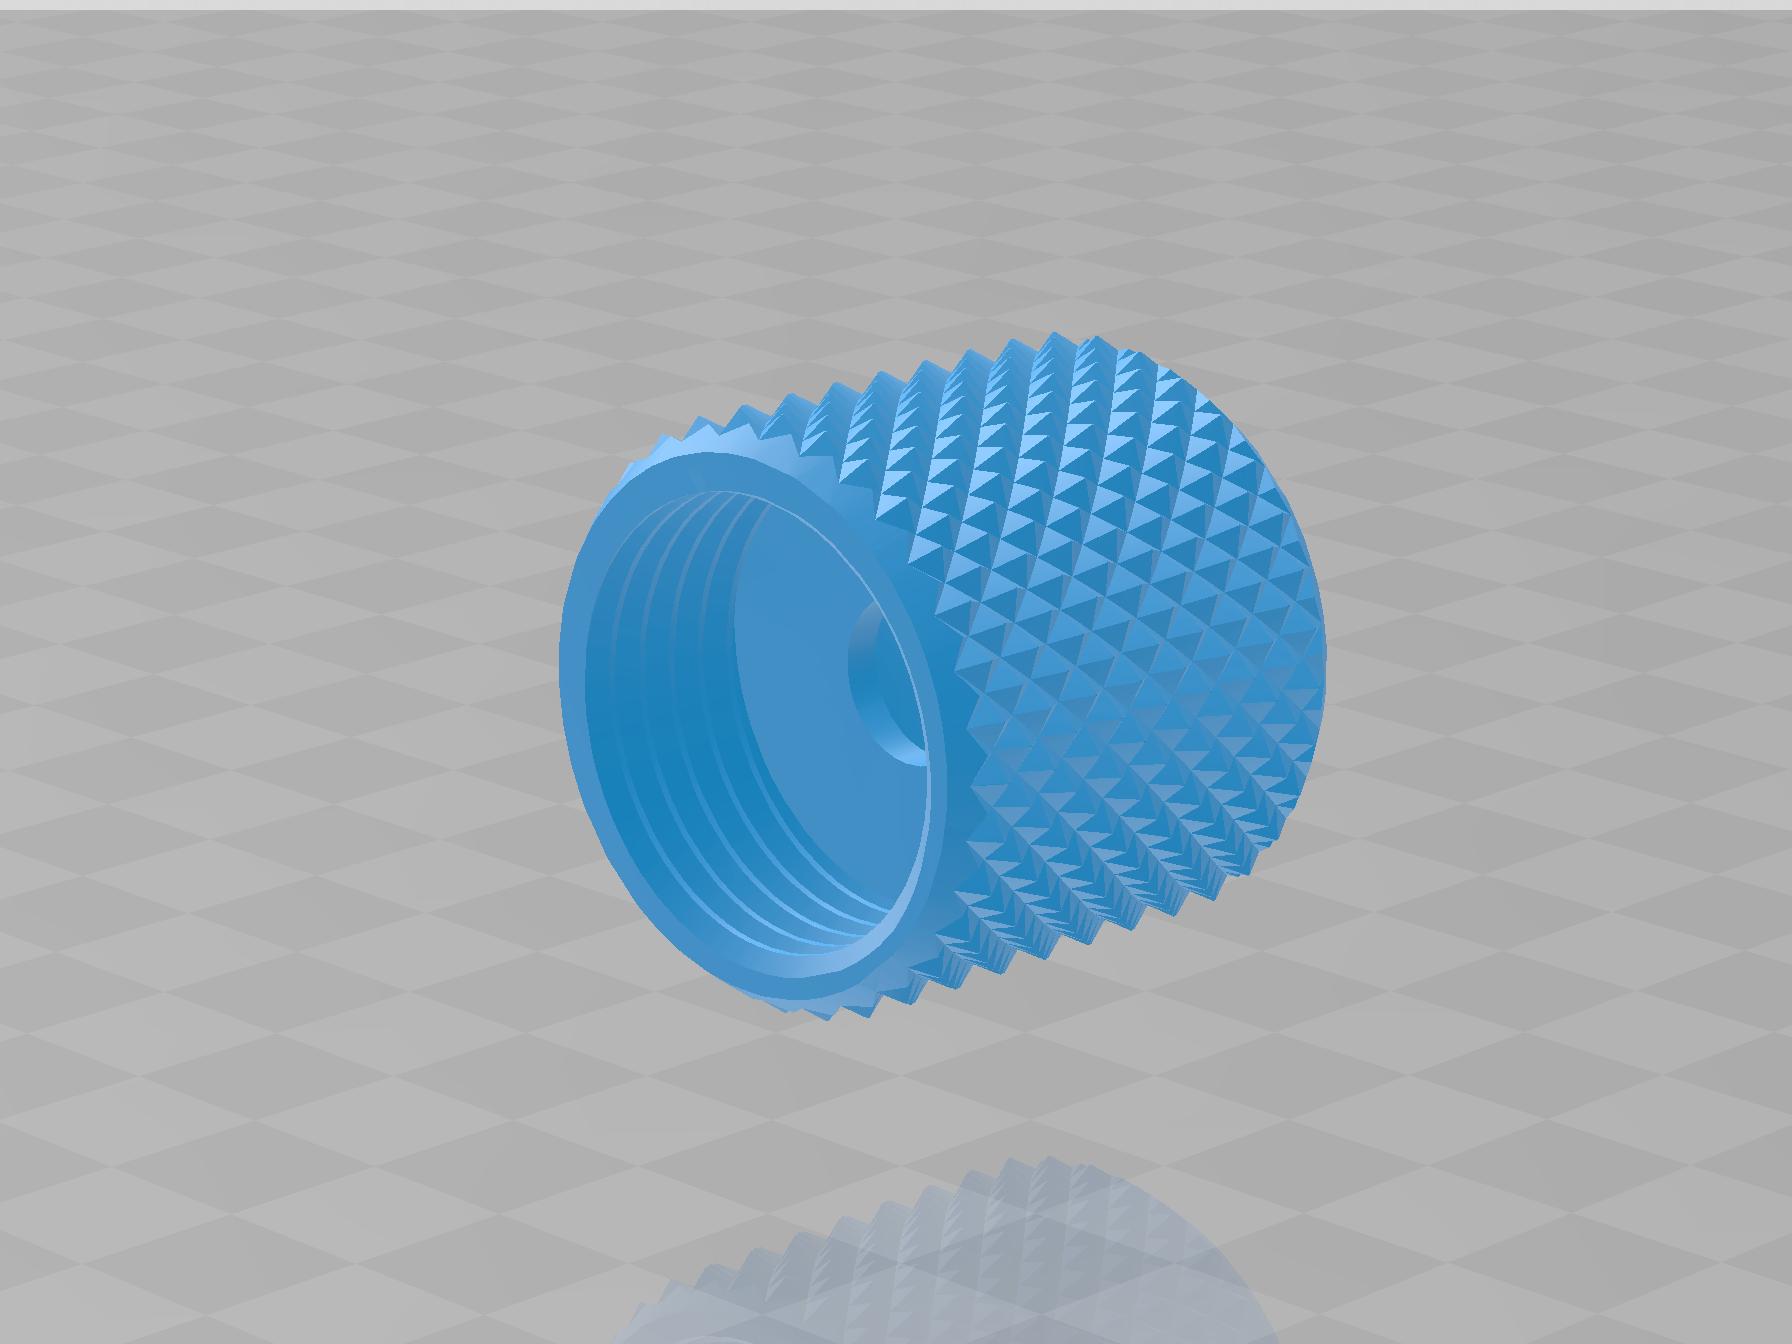 Watersaver_Garden_Faucet_.png Download free STL file Turbine Watersaver for garden faucet • 3D printer model, madsoul666